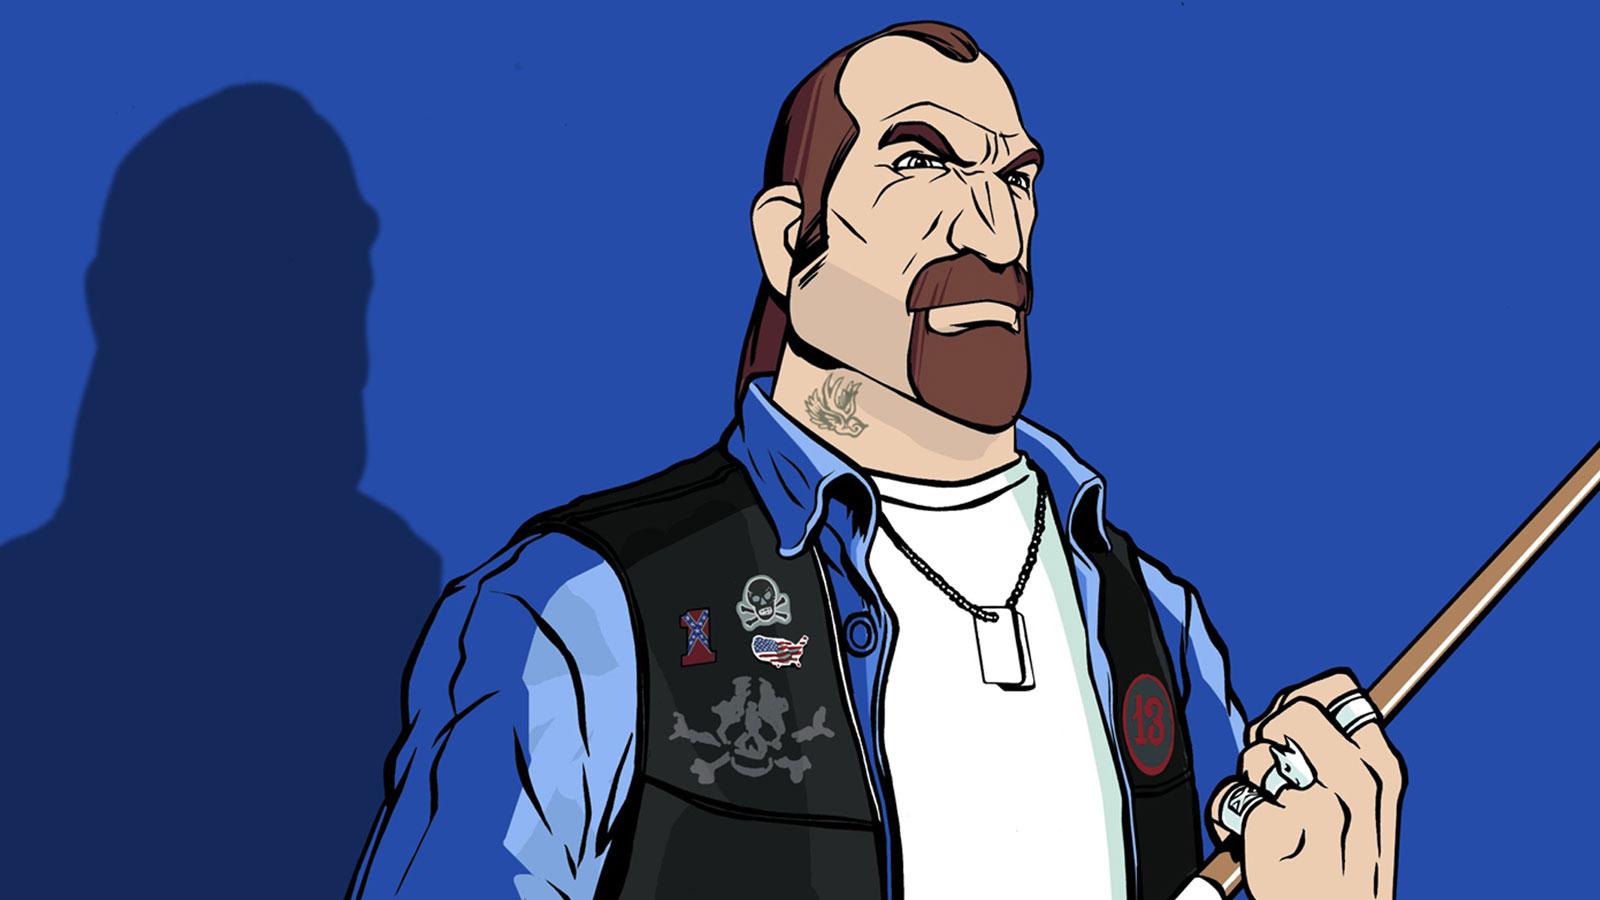 Free Grand Theft Auto: Vice City Wallpaper in 1600x900